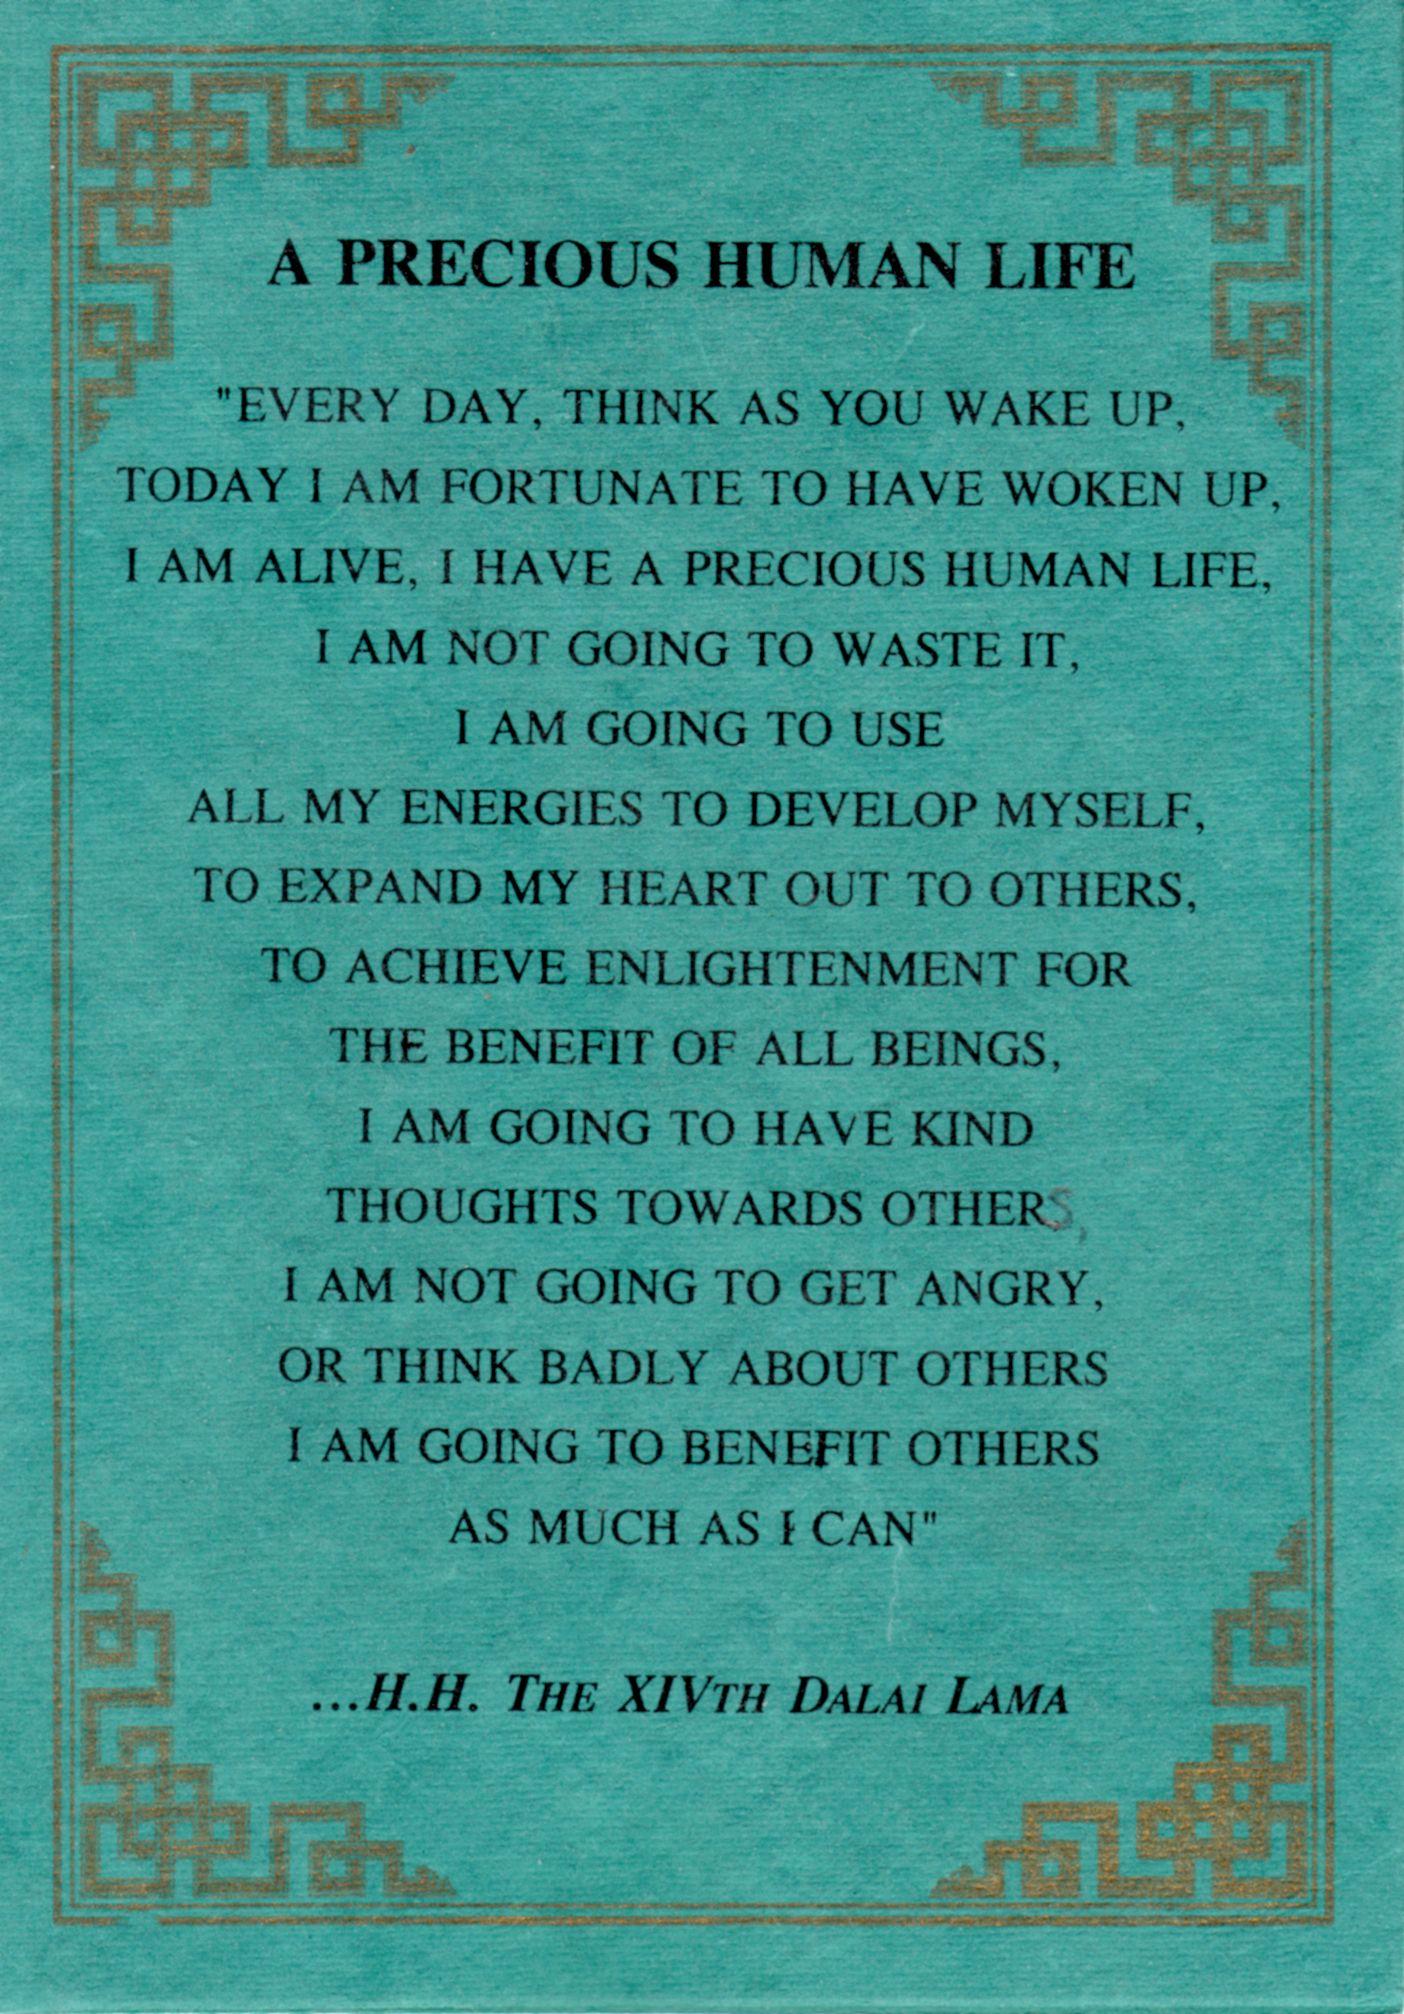 Dalai Lama Quotes Meaning Of Life